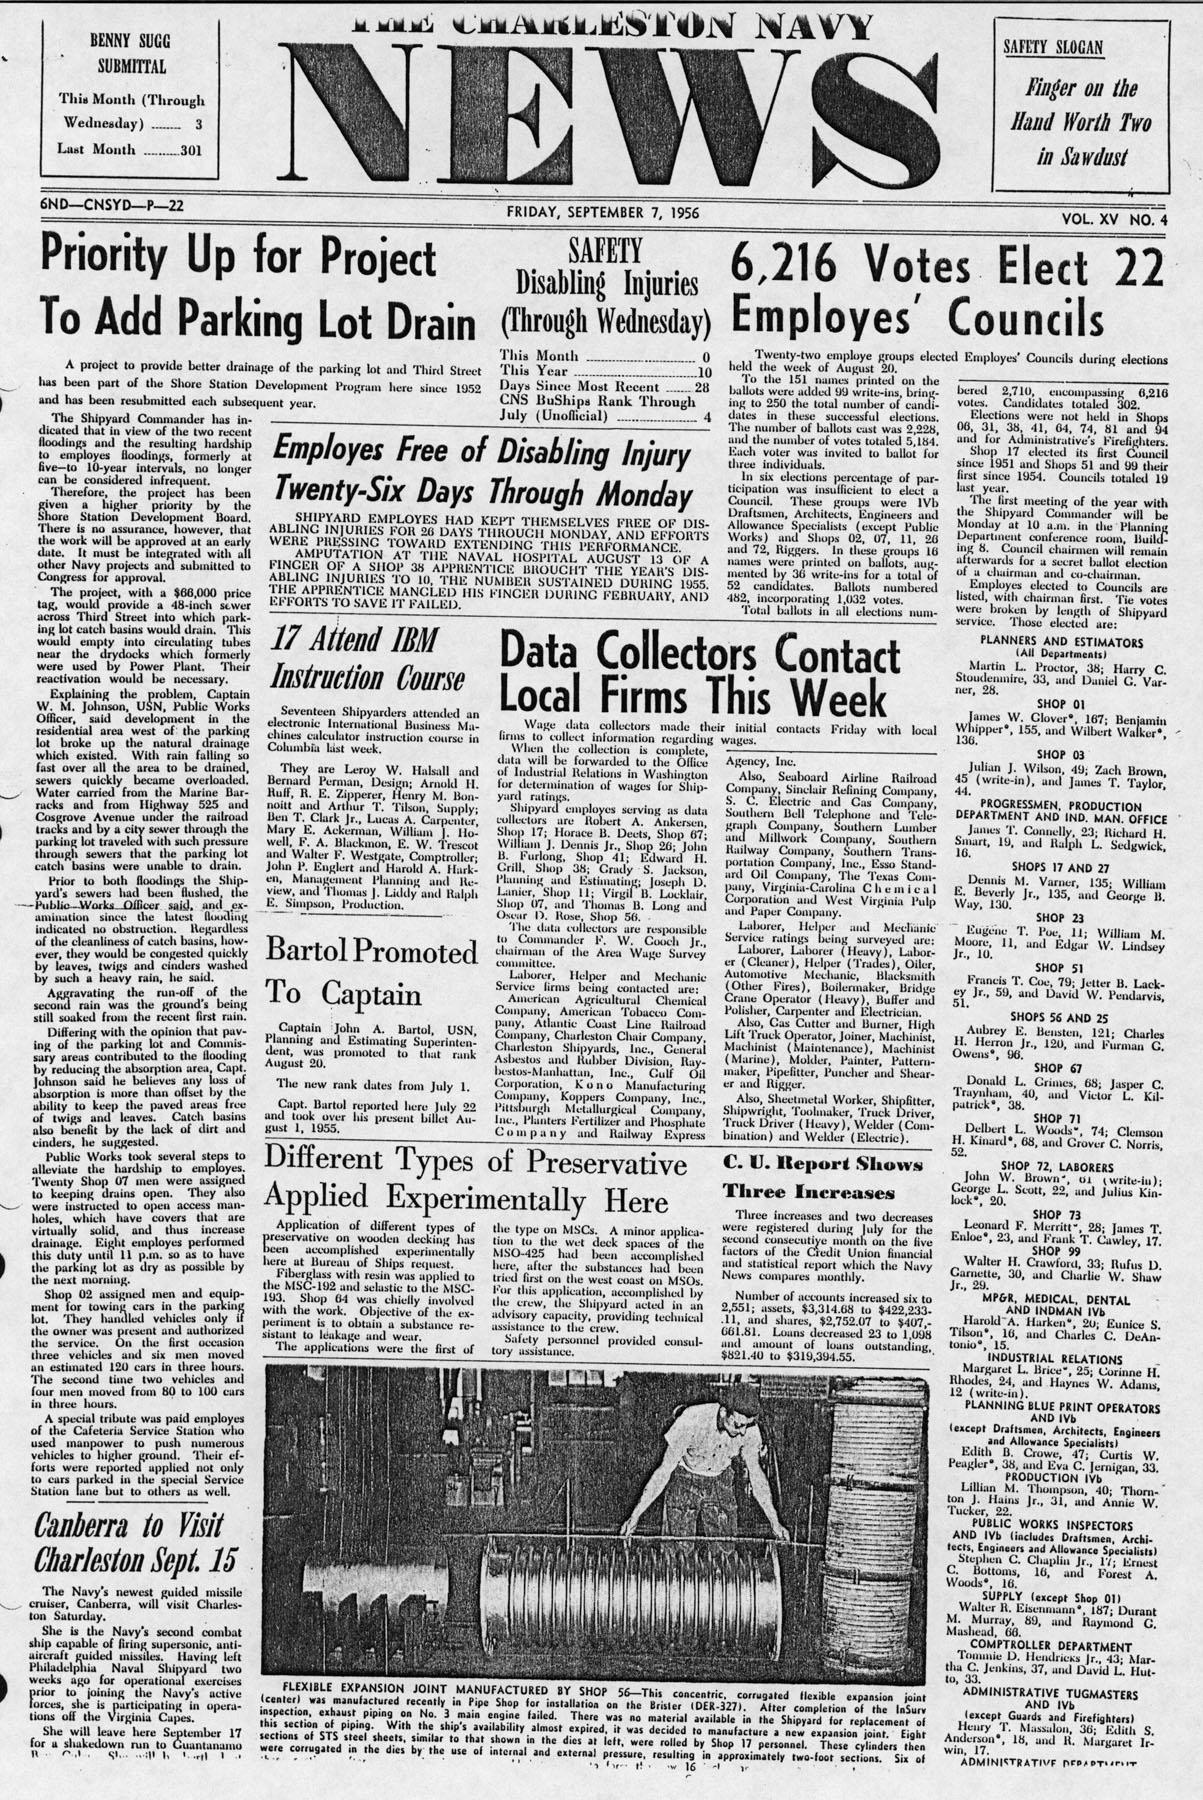 The Charleston Navy News, Volume 15, Edition 4, page i